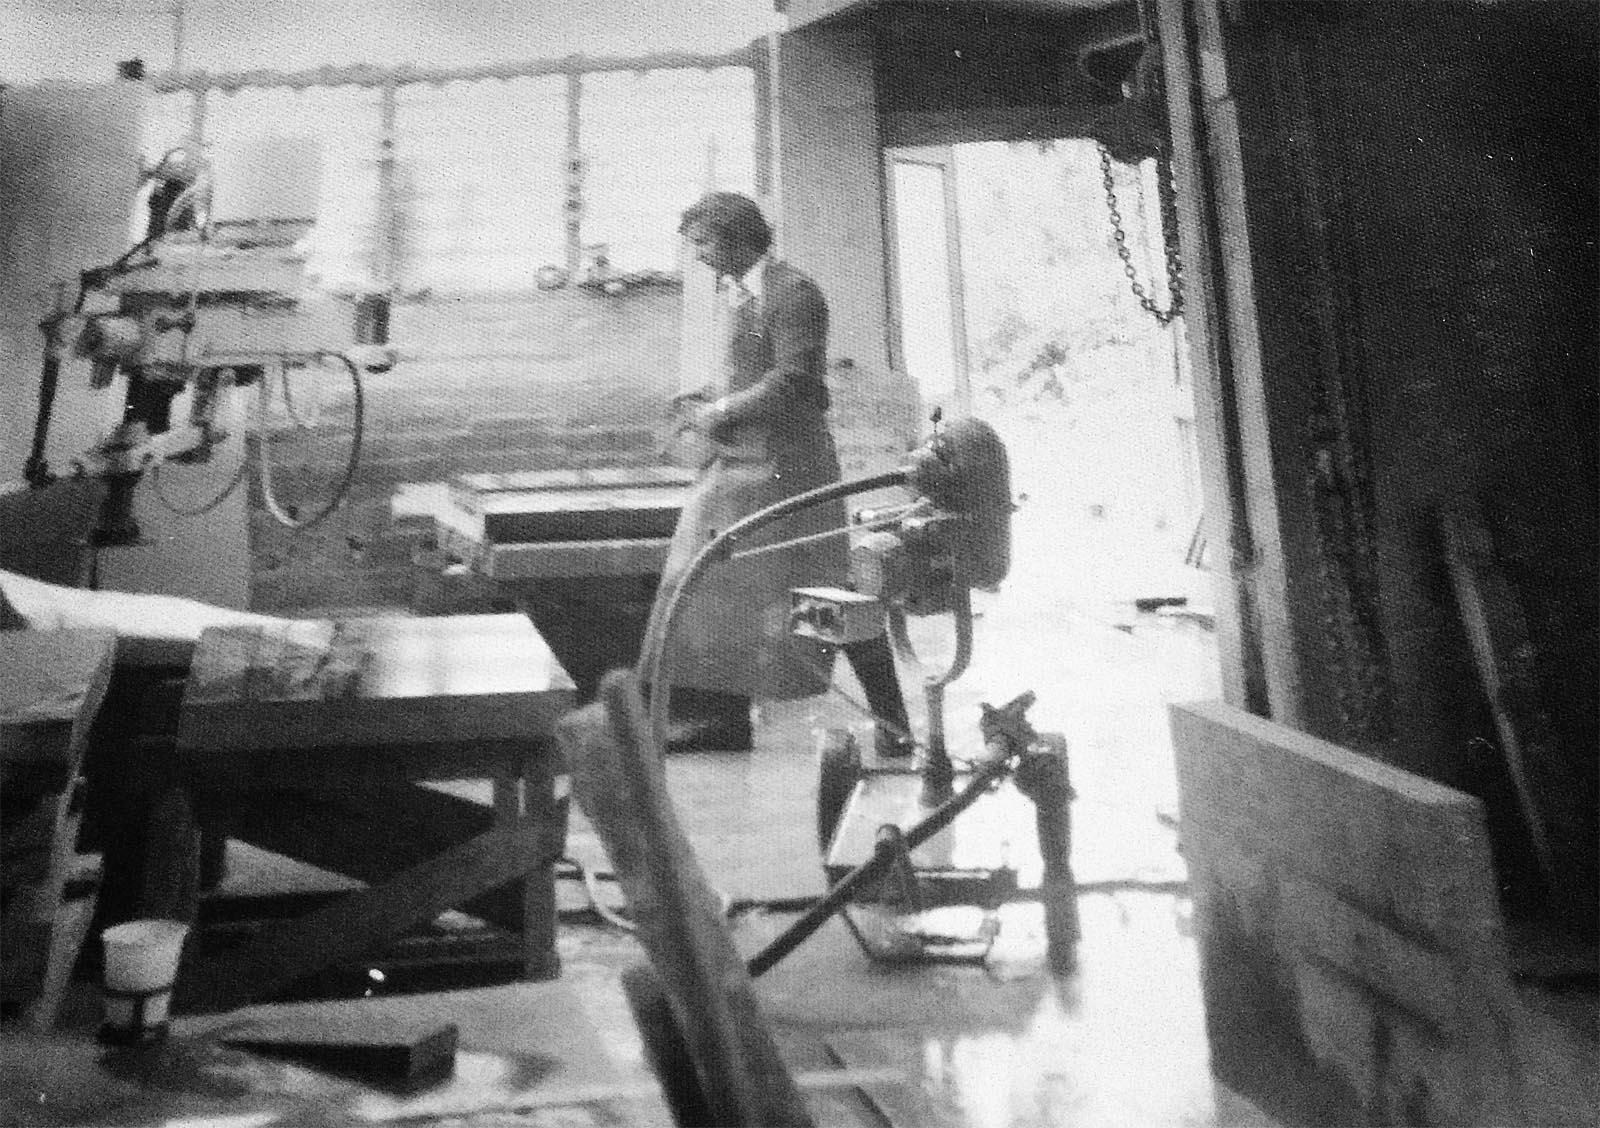 Guiseppe Grillo Natuursteen geschiedenis fabriek steenhouwer ambacht